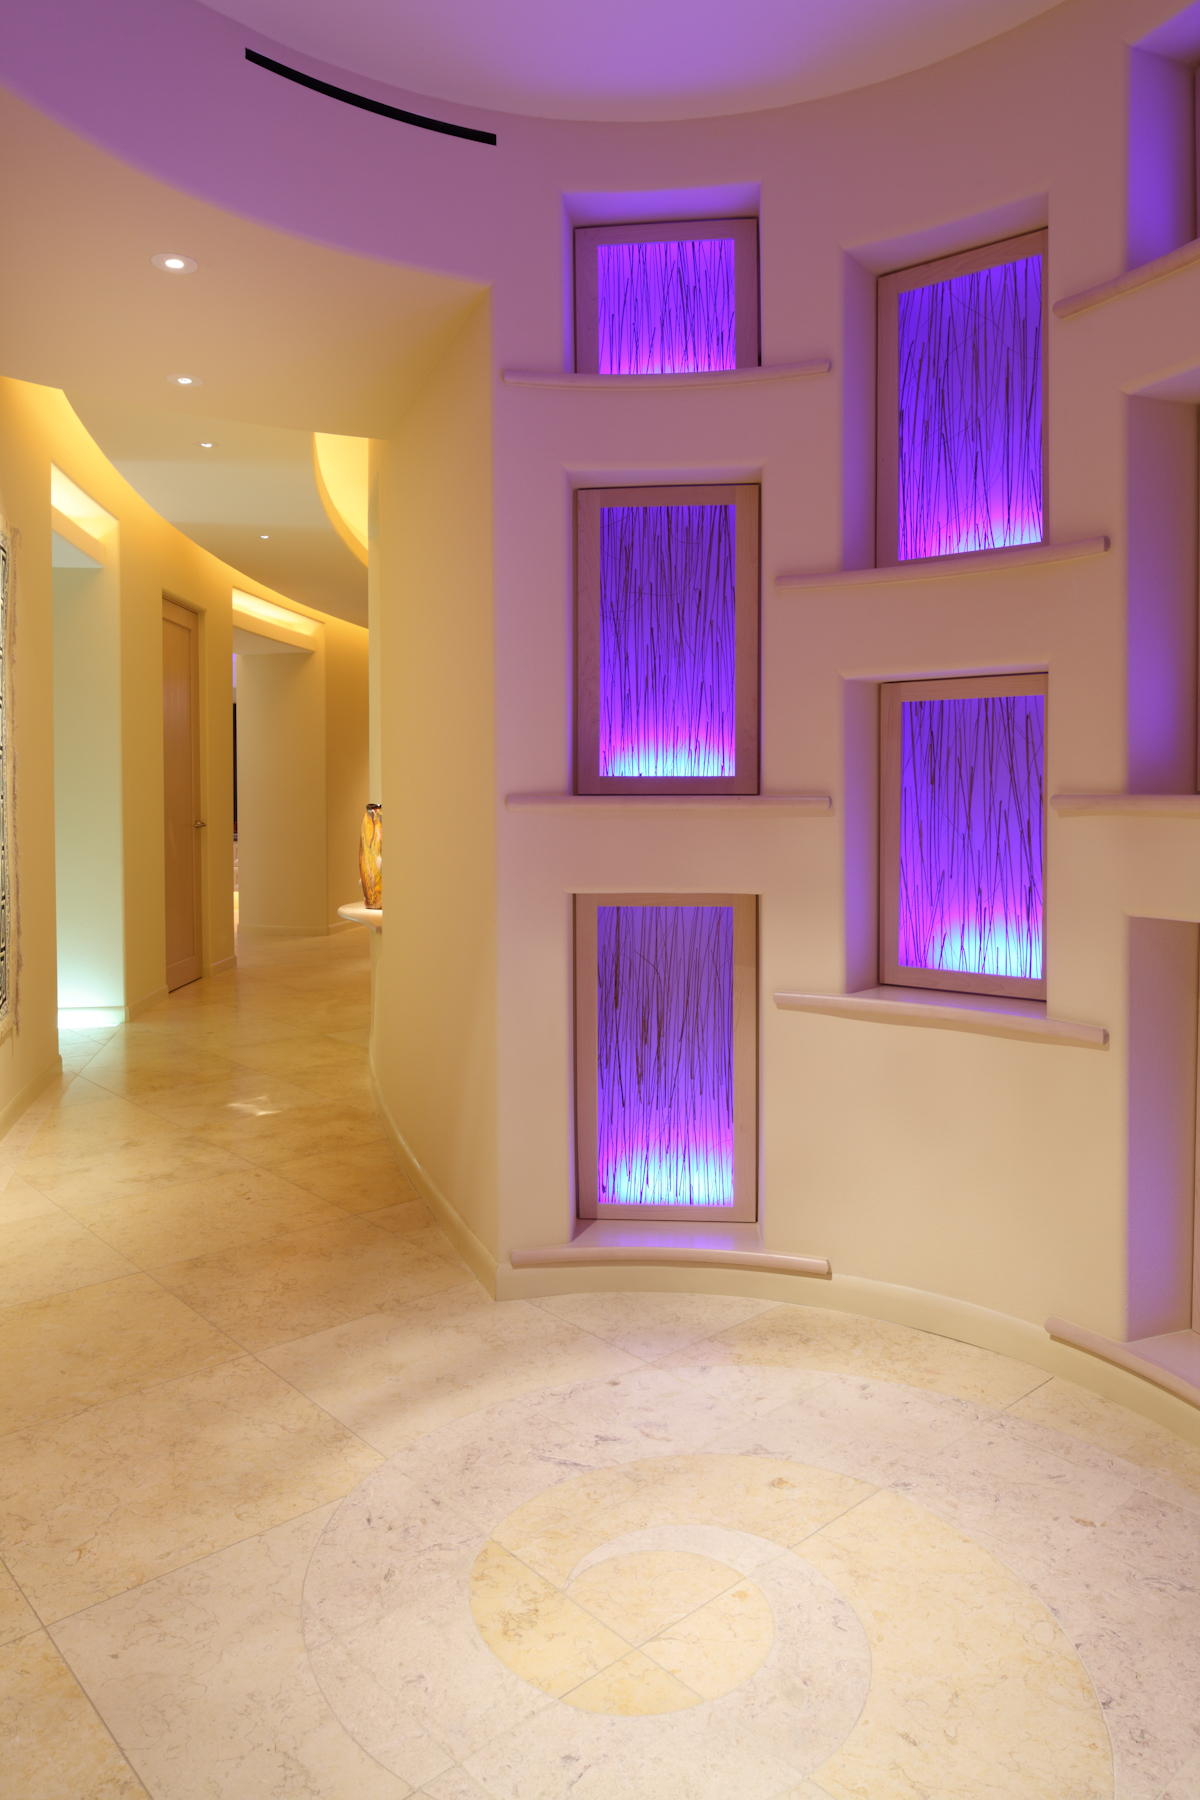 Подсветка в коридоре своими руками